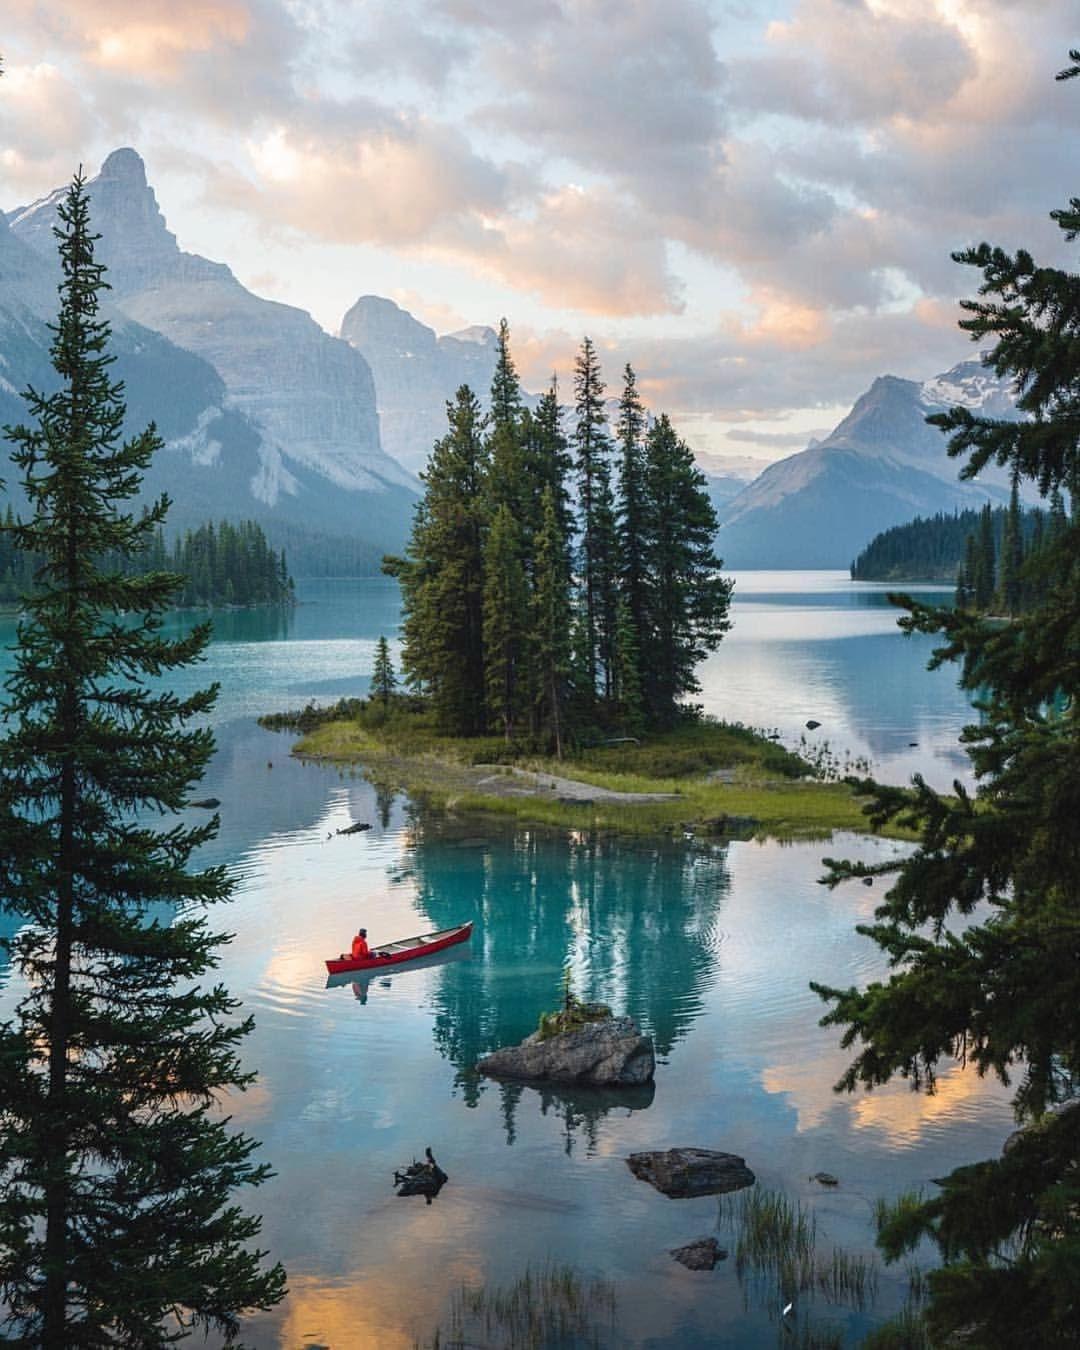 Jasper National Park Scenery Nature Landscape Photography